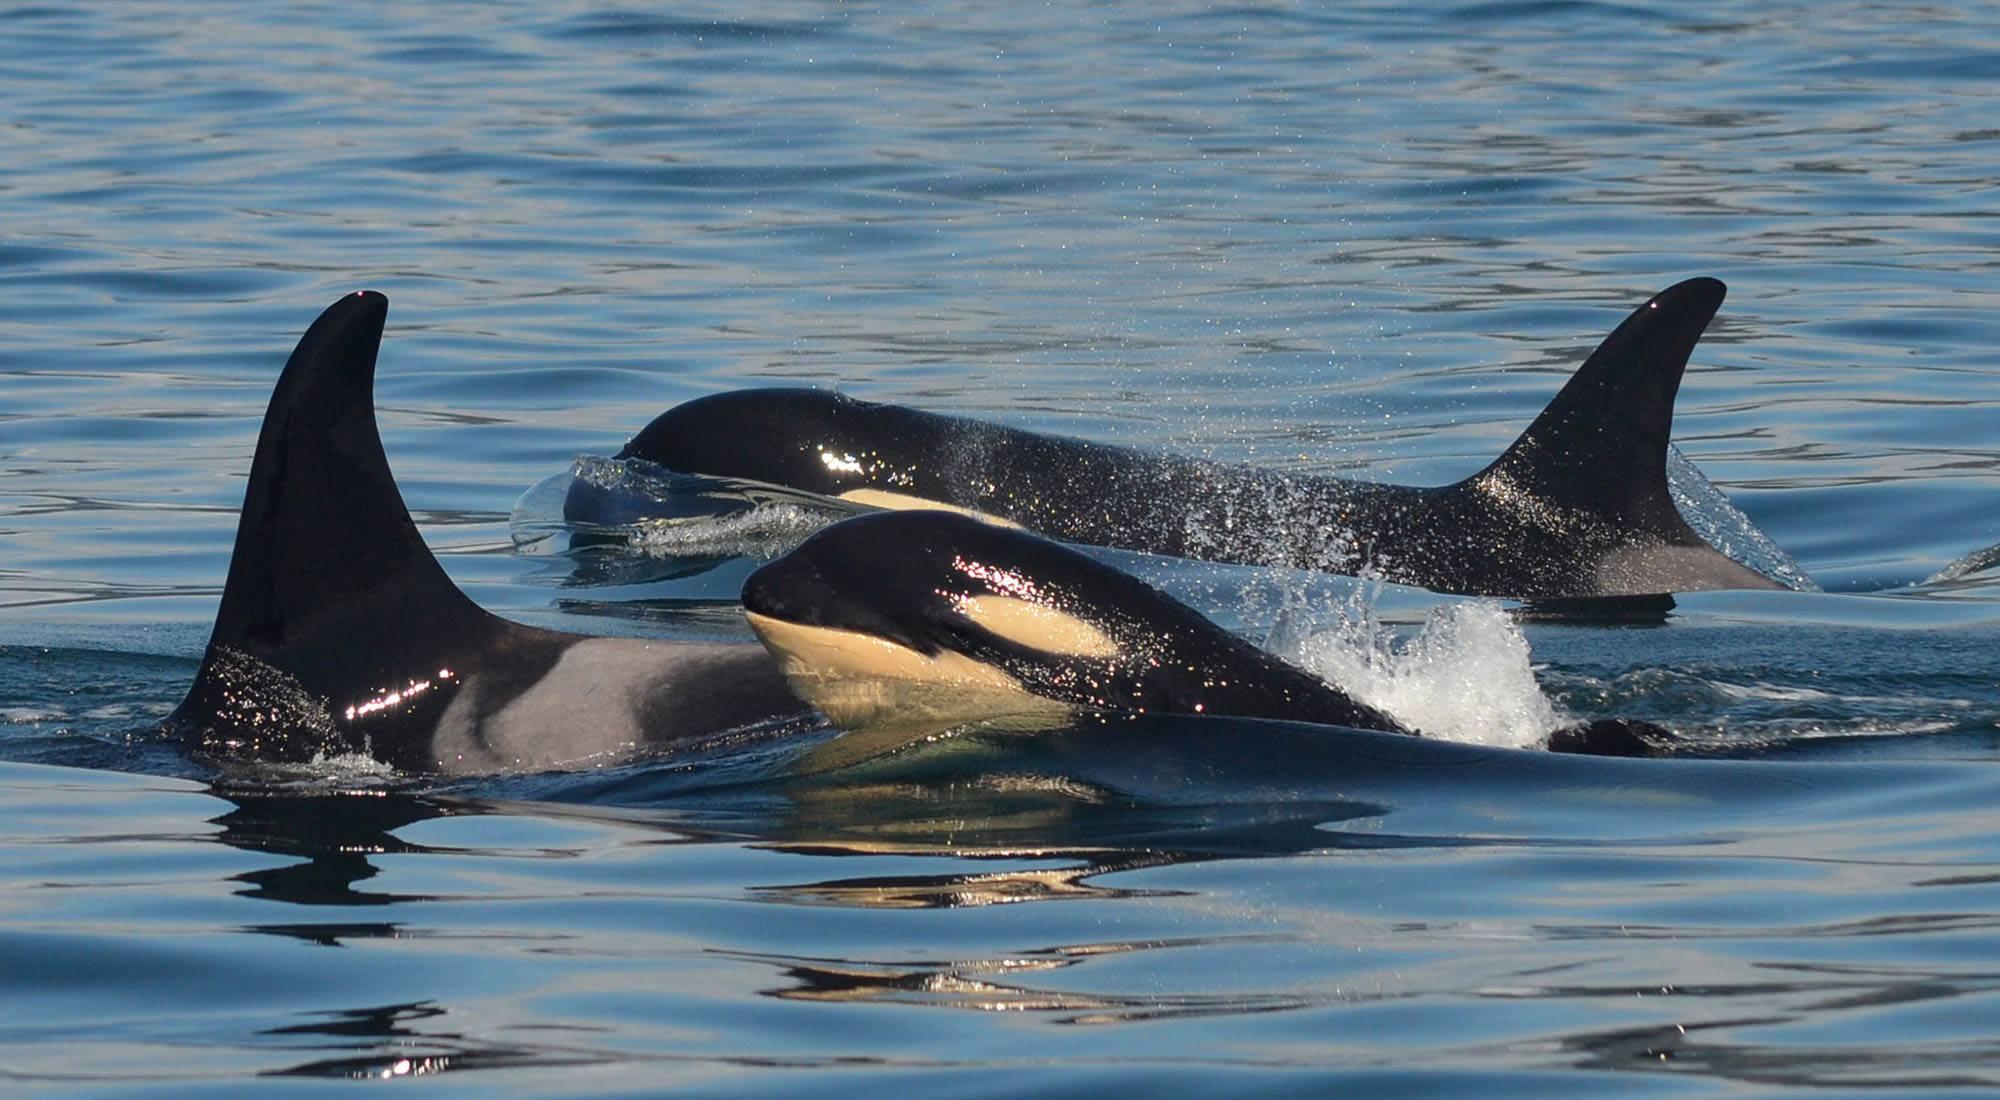 Orca calves Kiki (J53) with Princess Angeline (J17) and Moby (J44). Photo by Naturalist Tasli Shaw, Steveston Seabreeze Adventures, Richmond, BC.